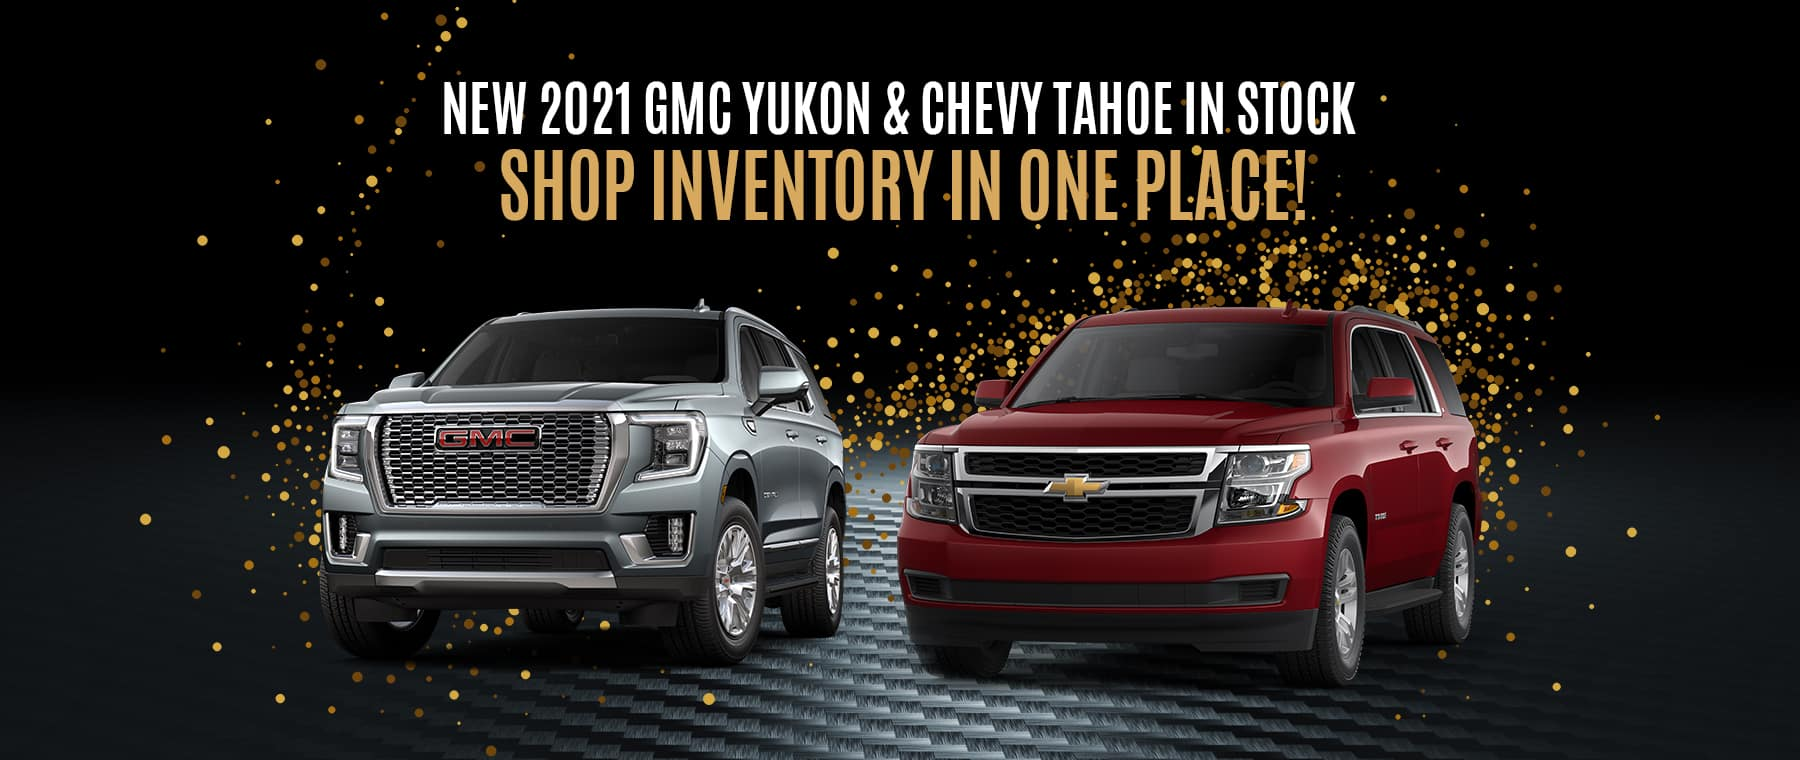 New Tahoe and Yukon in stock near Sellersburg, Indiana